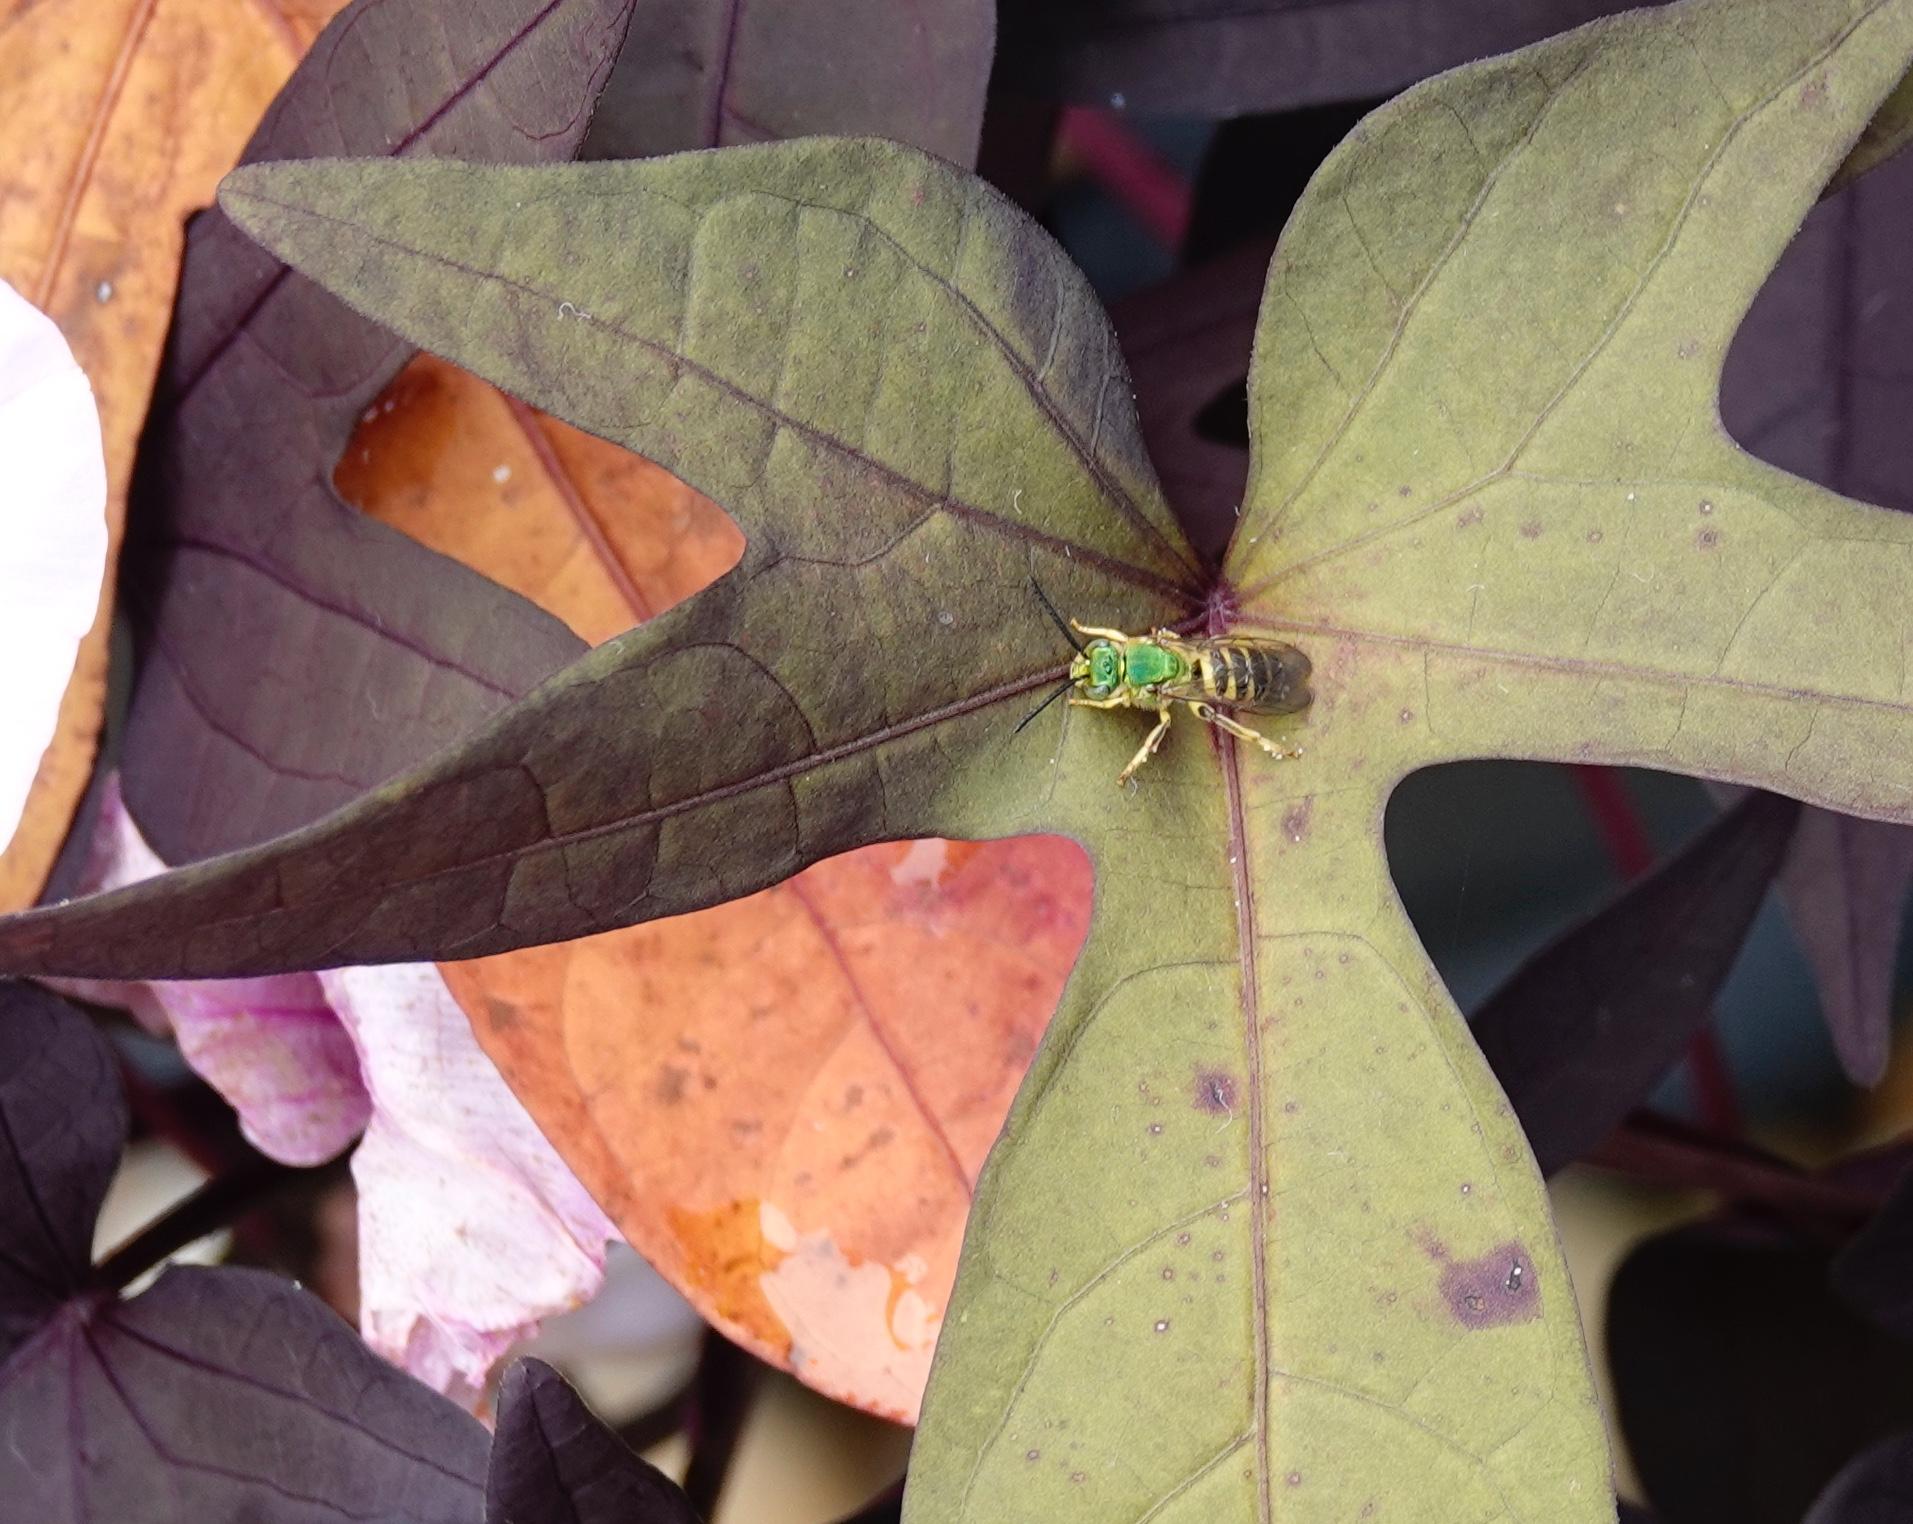 Another tiny, metallic green bee.